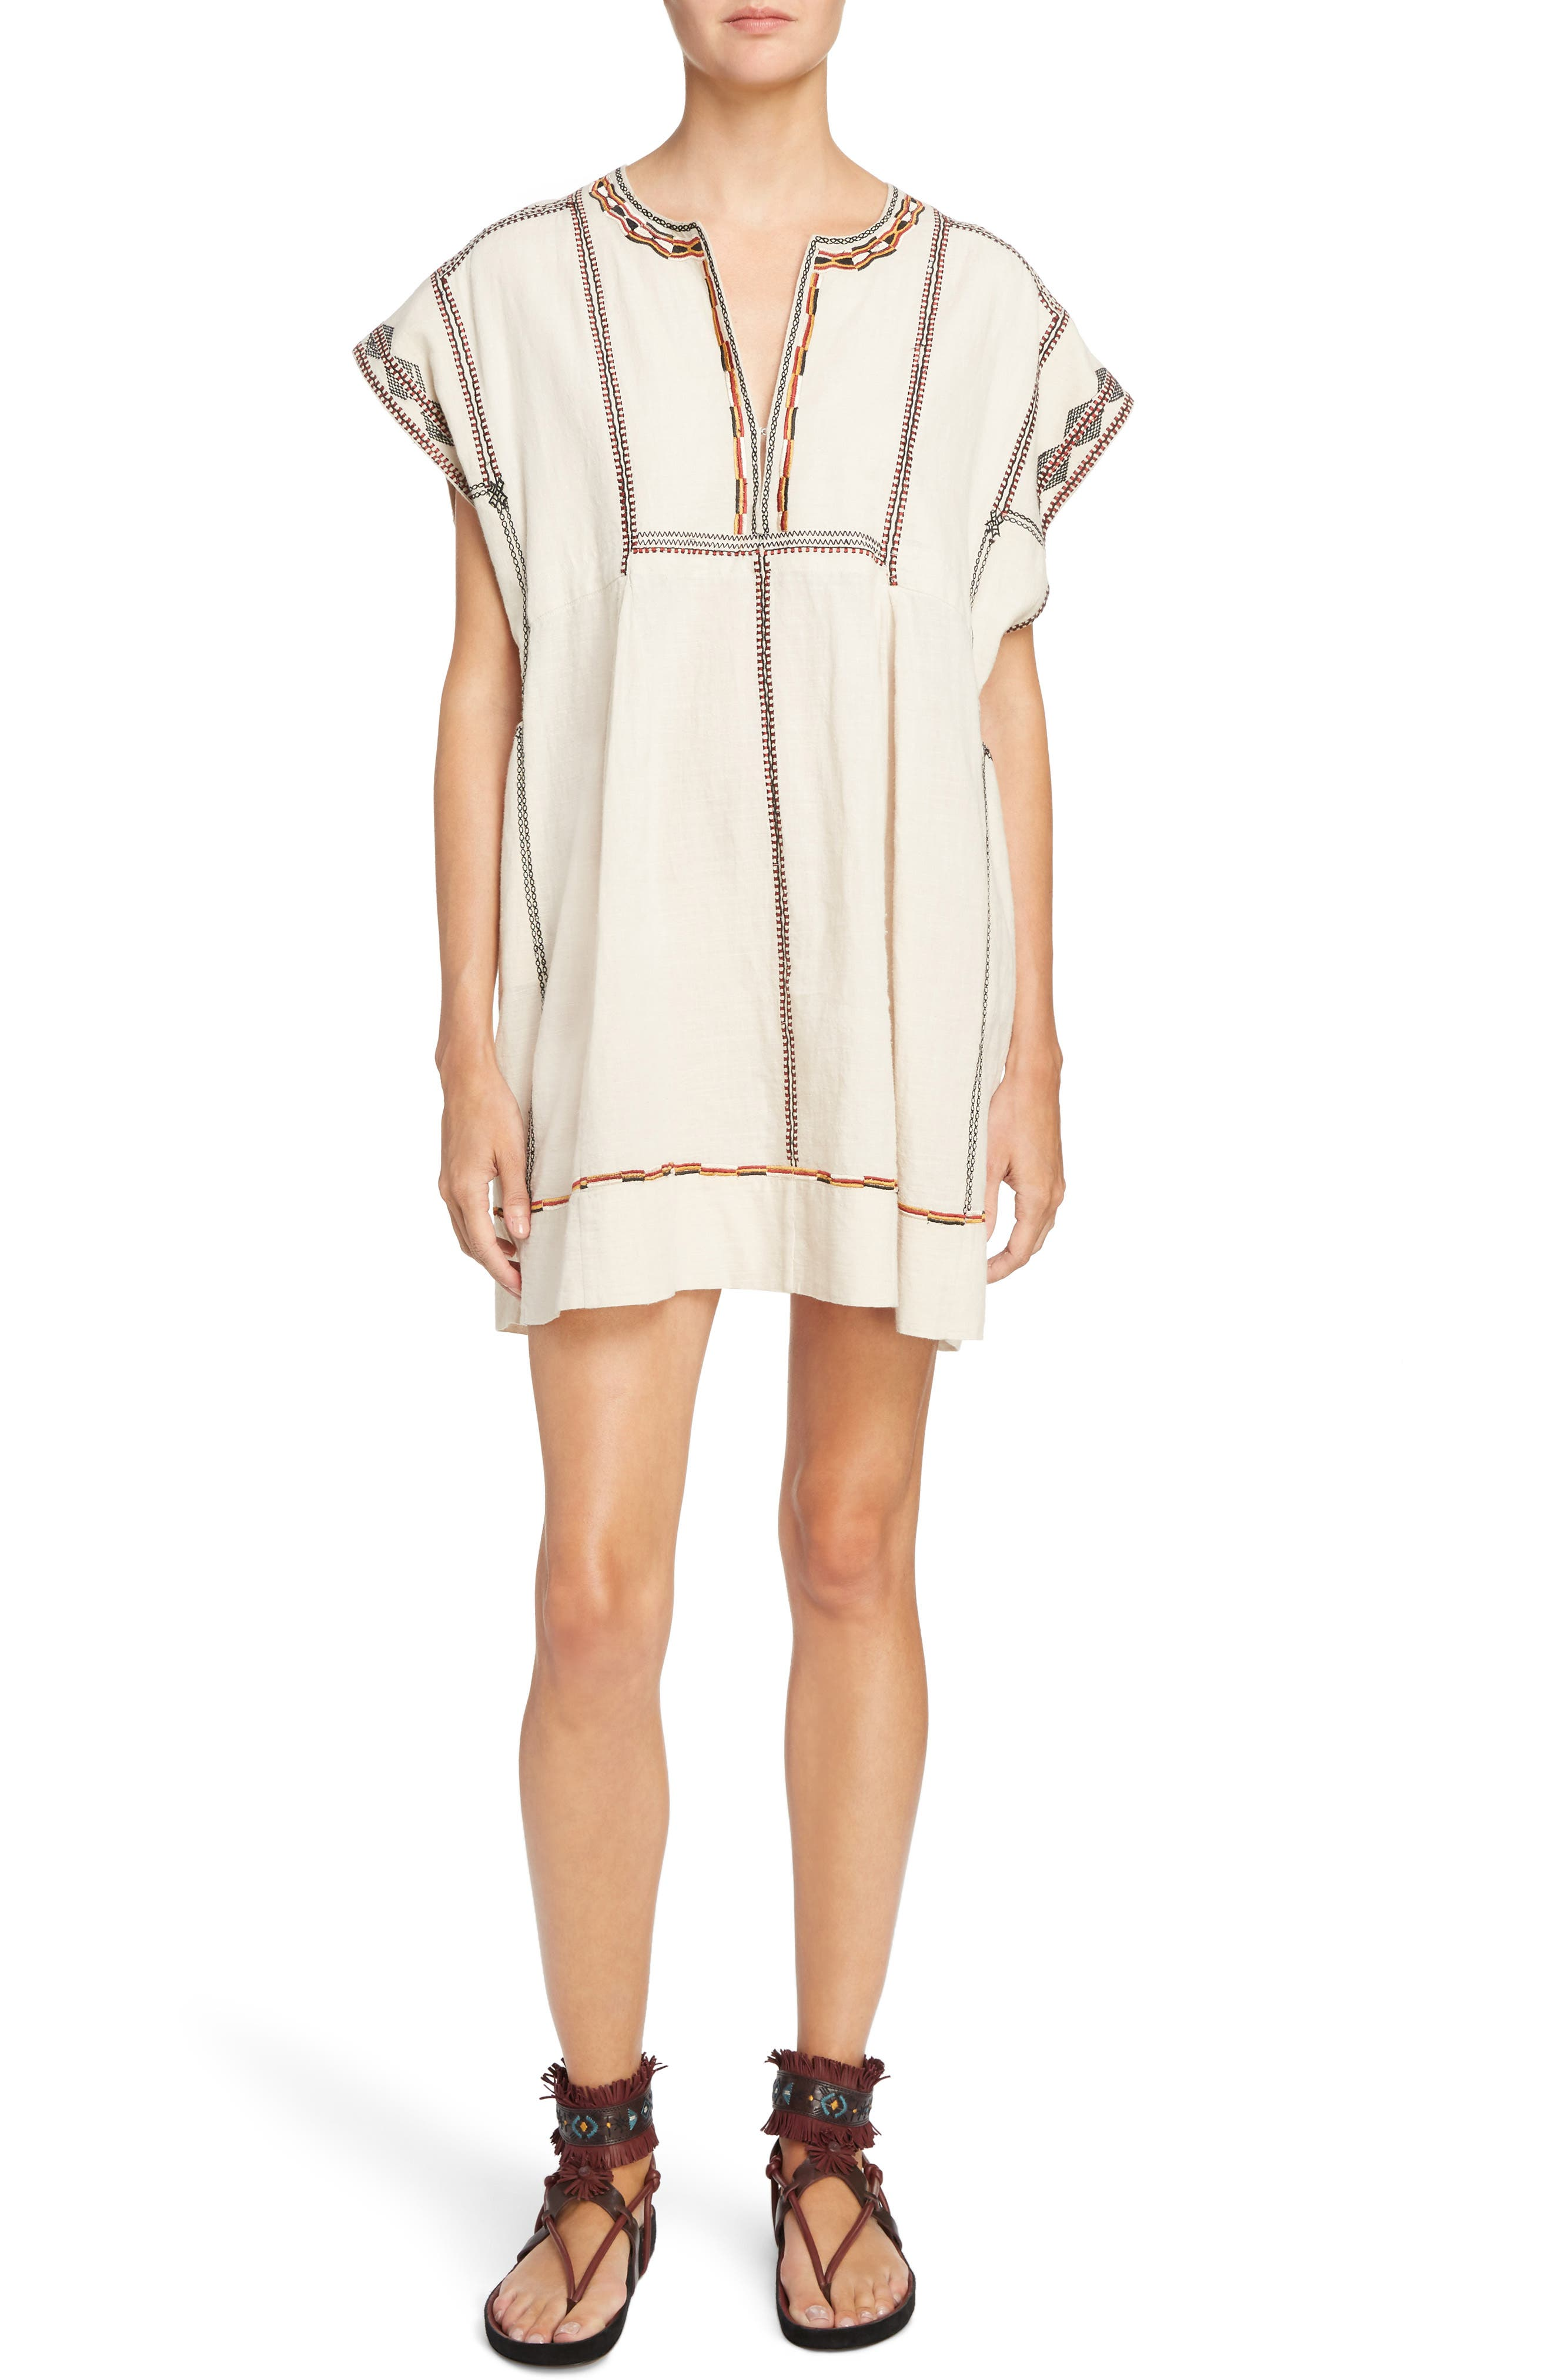 Alternate Image 1 Selected - Isabel Marant Étoile Belissa Embroidered Shift Dress